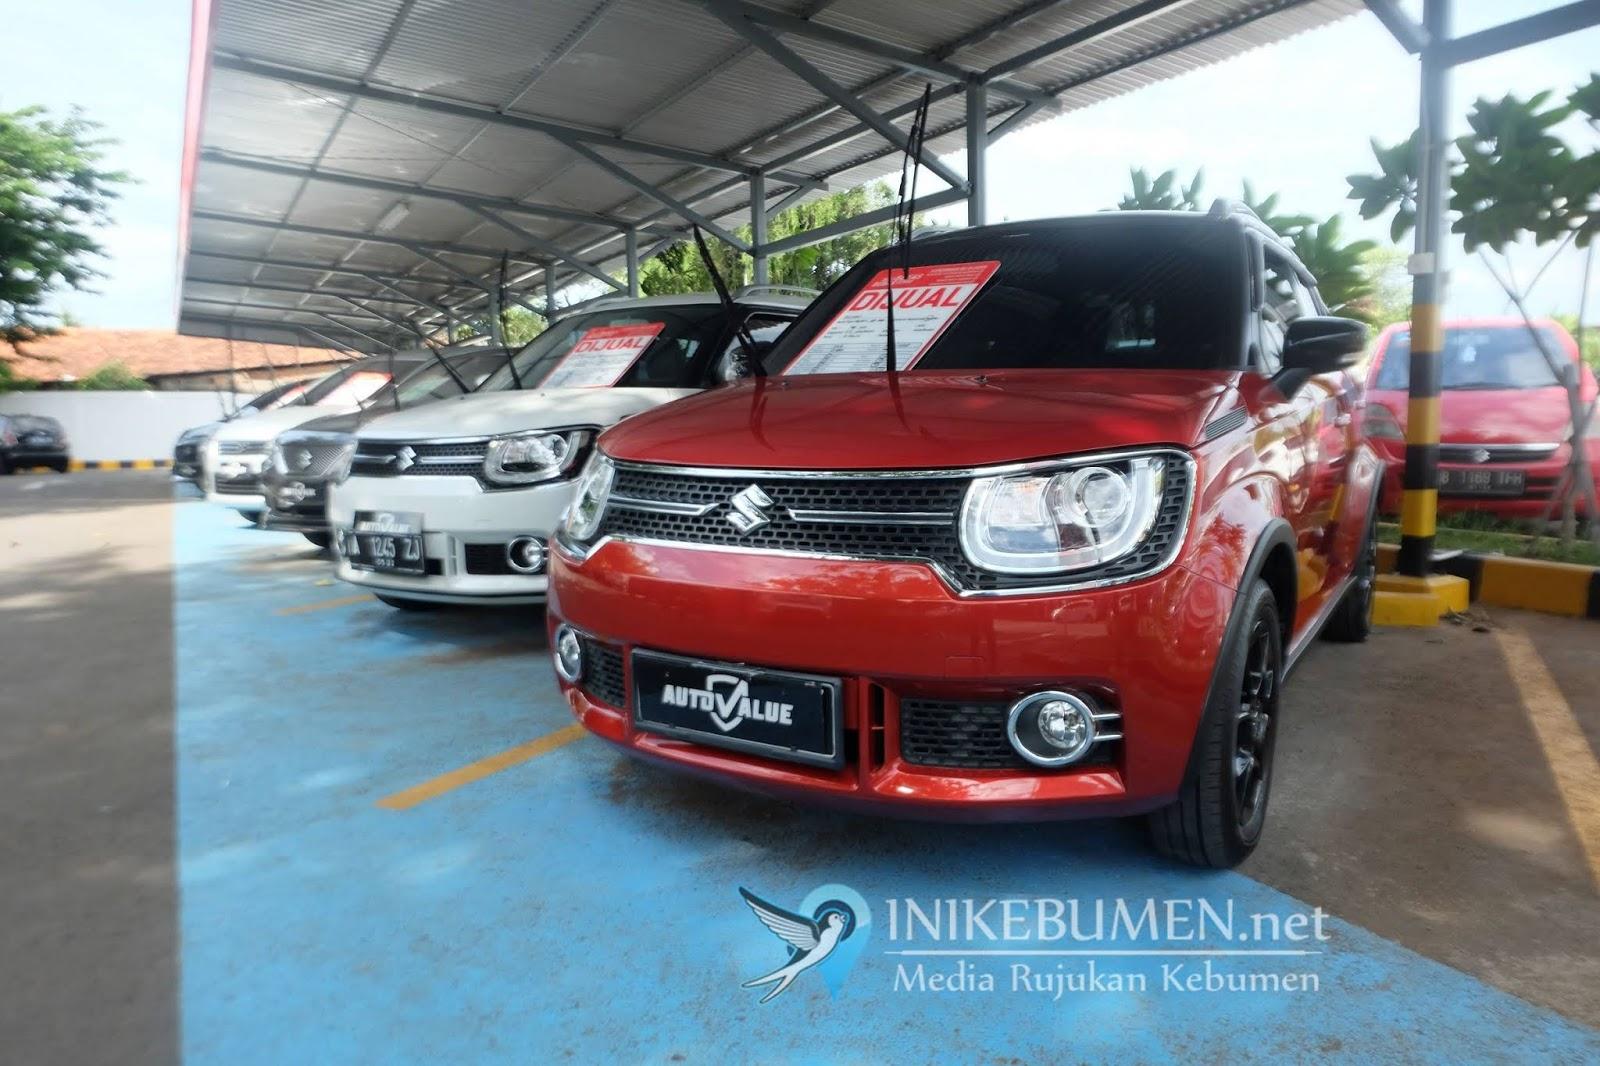 Lewat Program YES, Suzuki Auto Value Berikan Penawaran Menarik